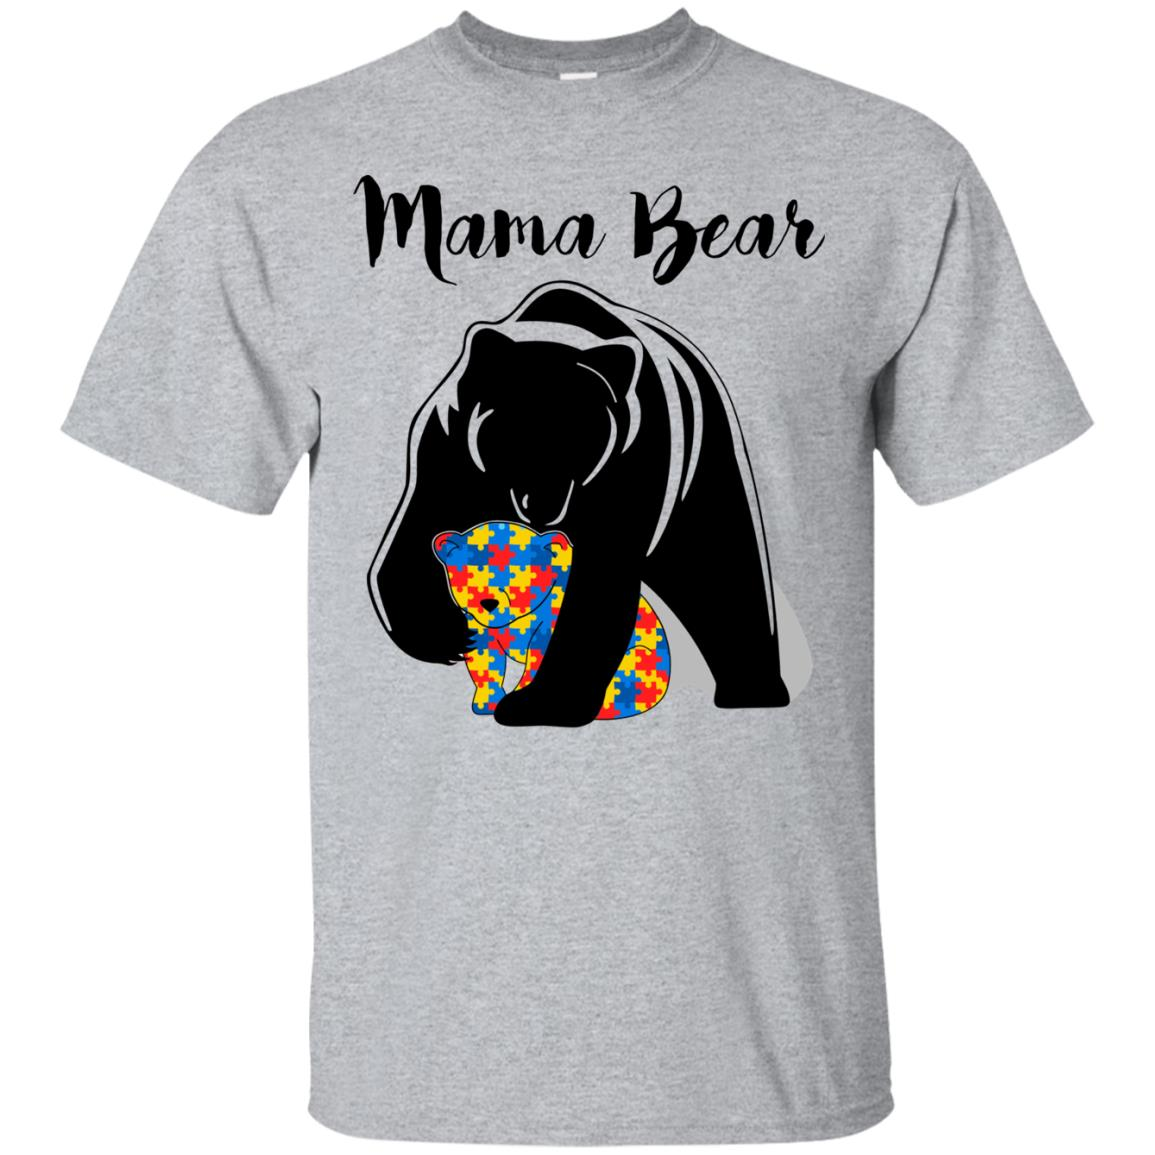 8795a8ce Autism Mama Bear shirt, tank top, long sleeve, ladies tee